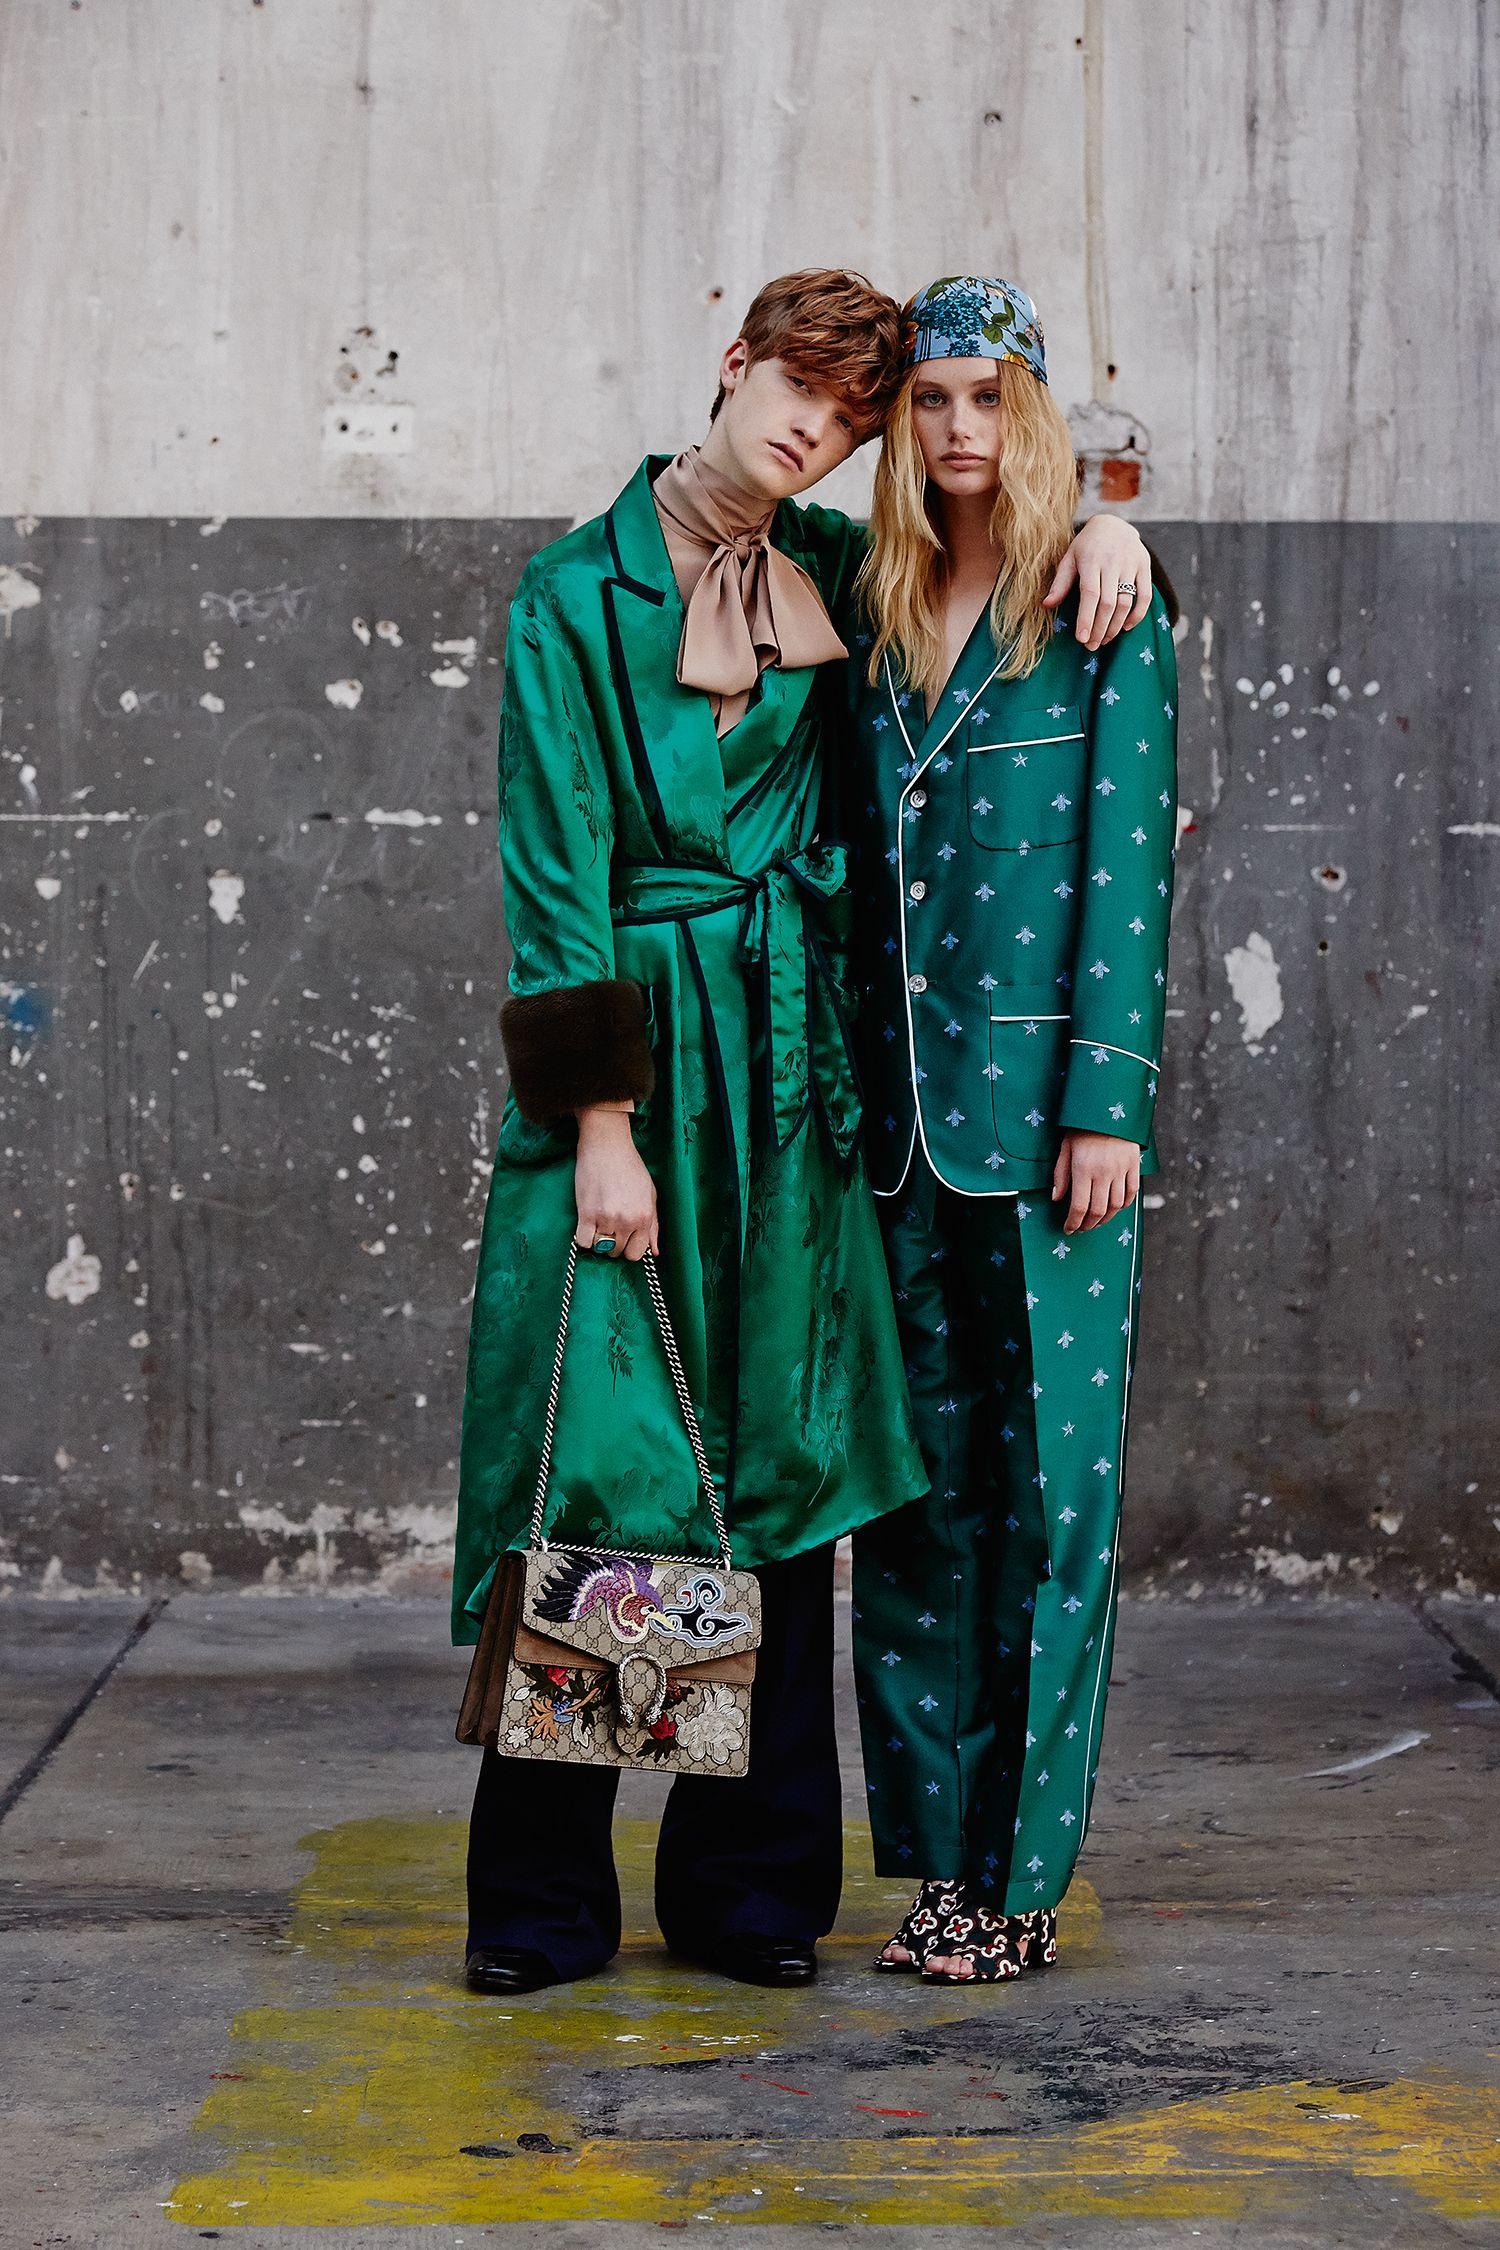 Como Alessandro Michele está subvertendo os limites do gênero na Gucci